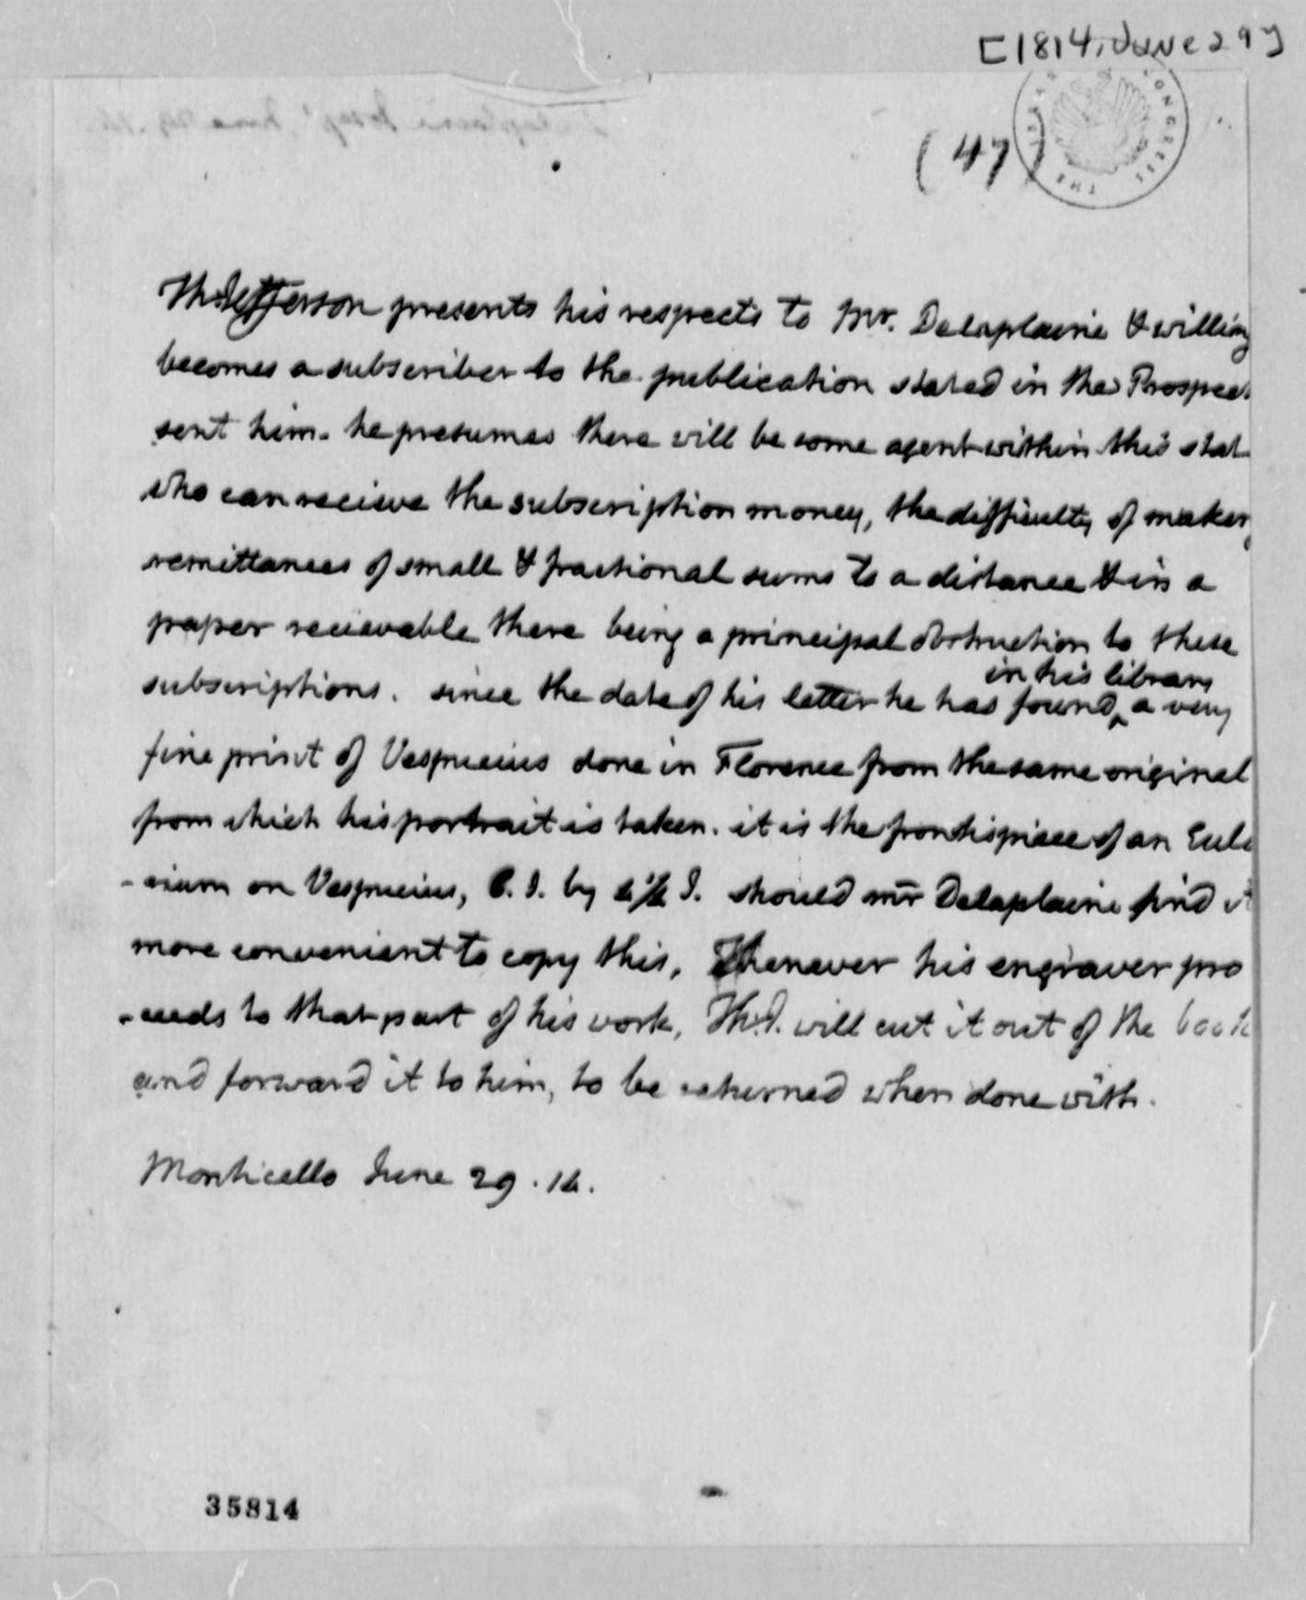 Thomas Jefferson to Joseph Delaplaine, June 29, 1814